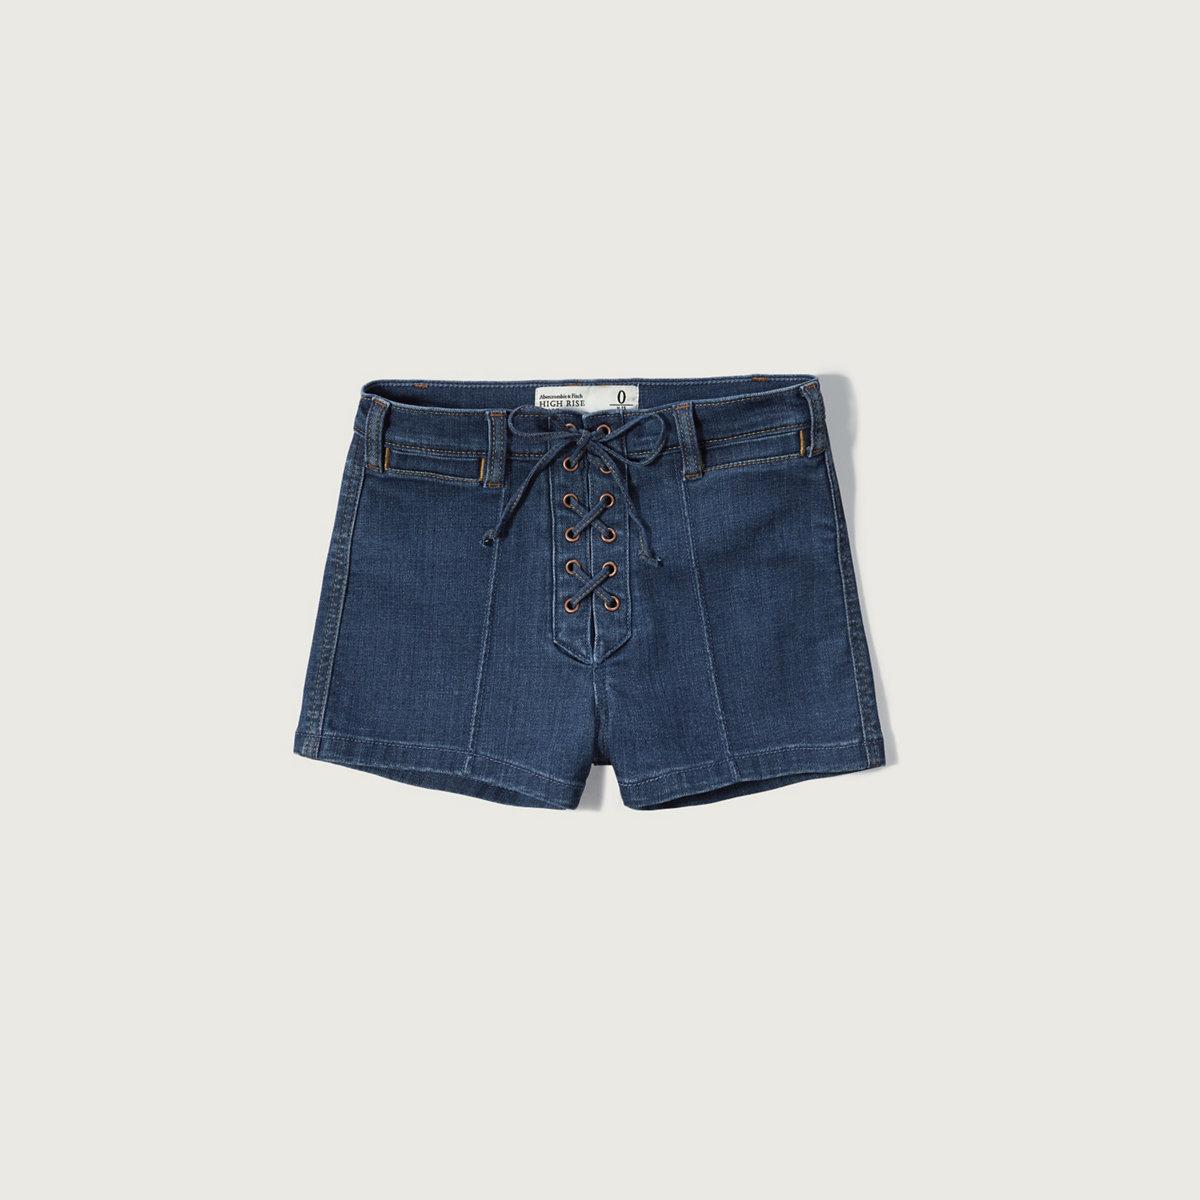 High Rise 2 Inch Shorts